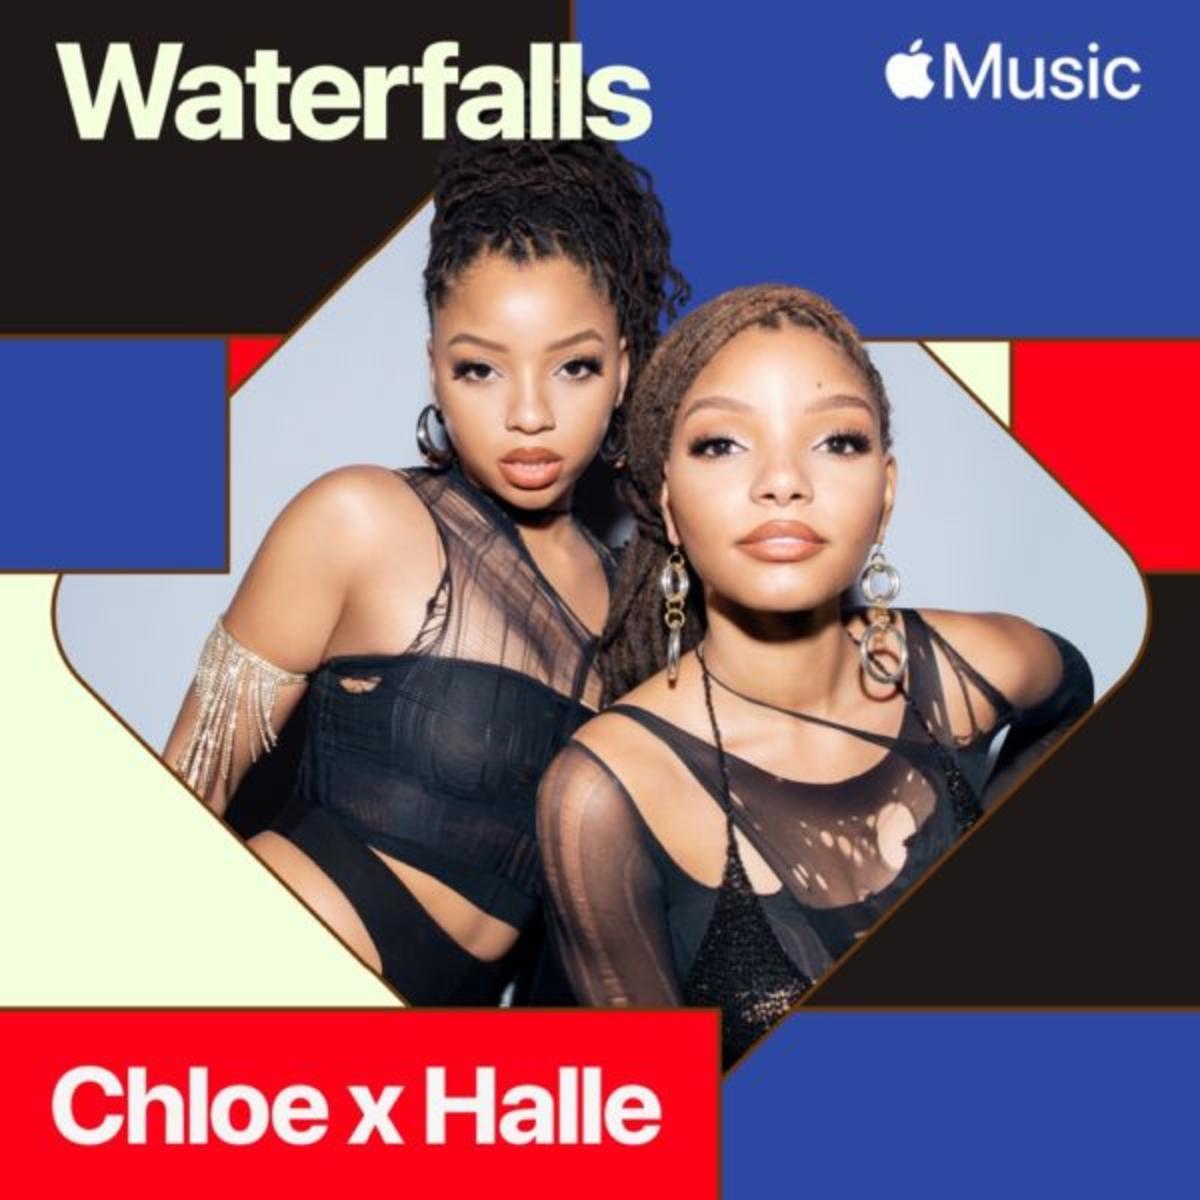 Chloe X Halle - Waterfalls